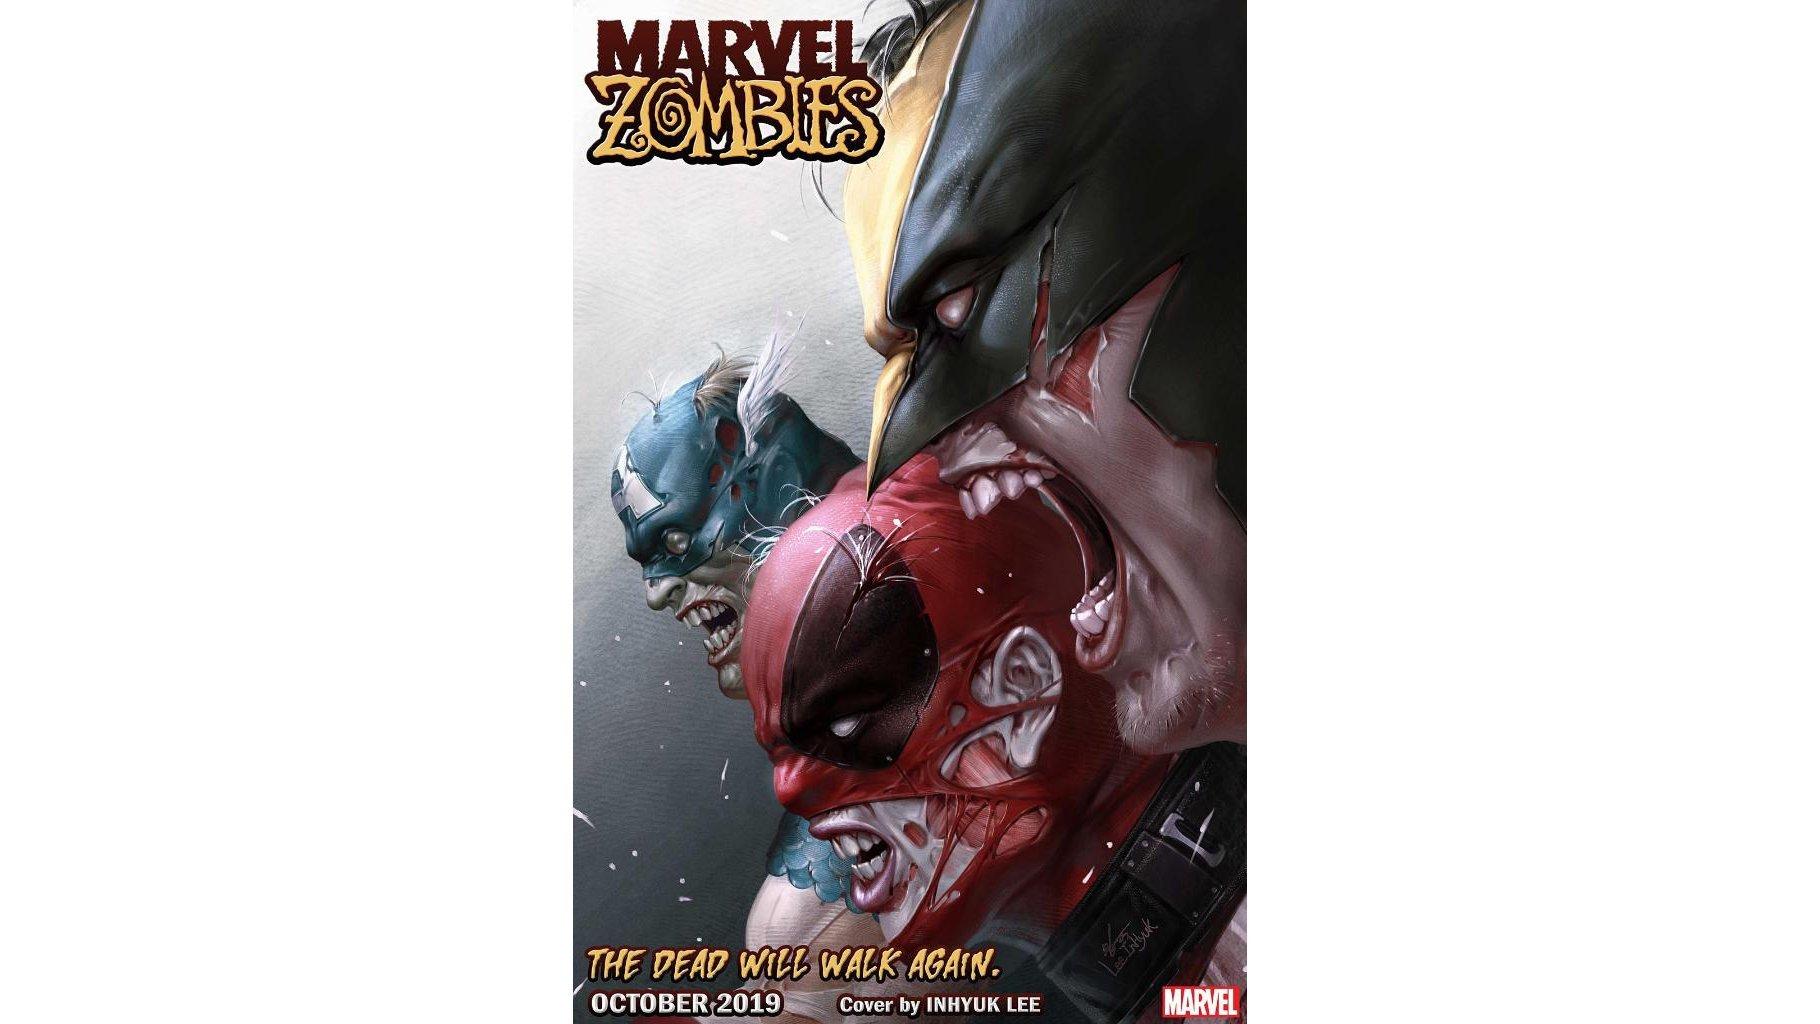 Marvel announces return of 'Marvel Zombies' comics